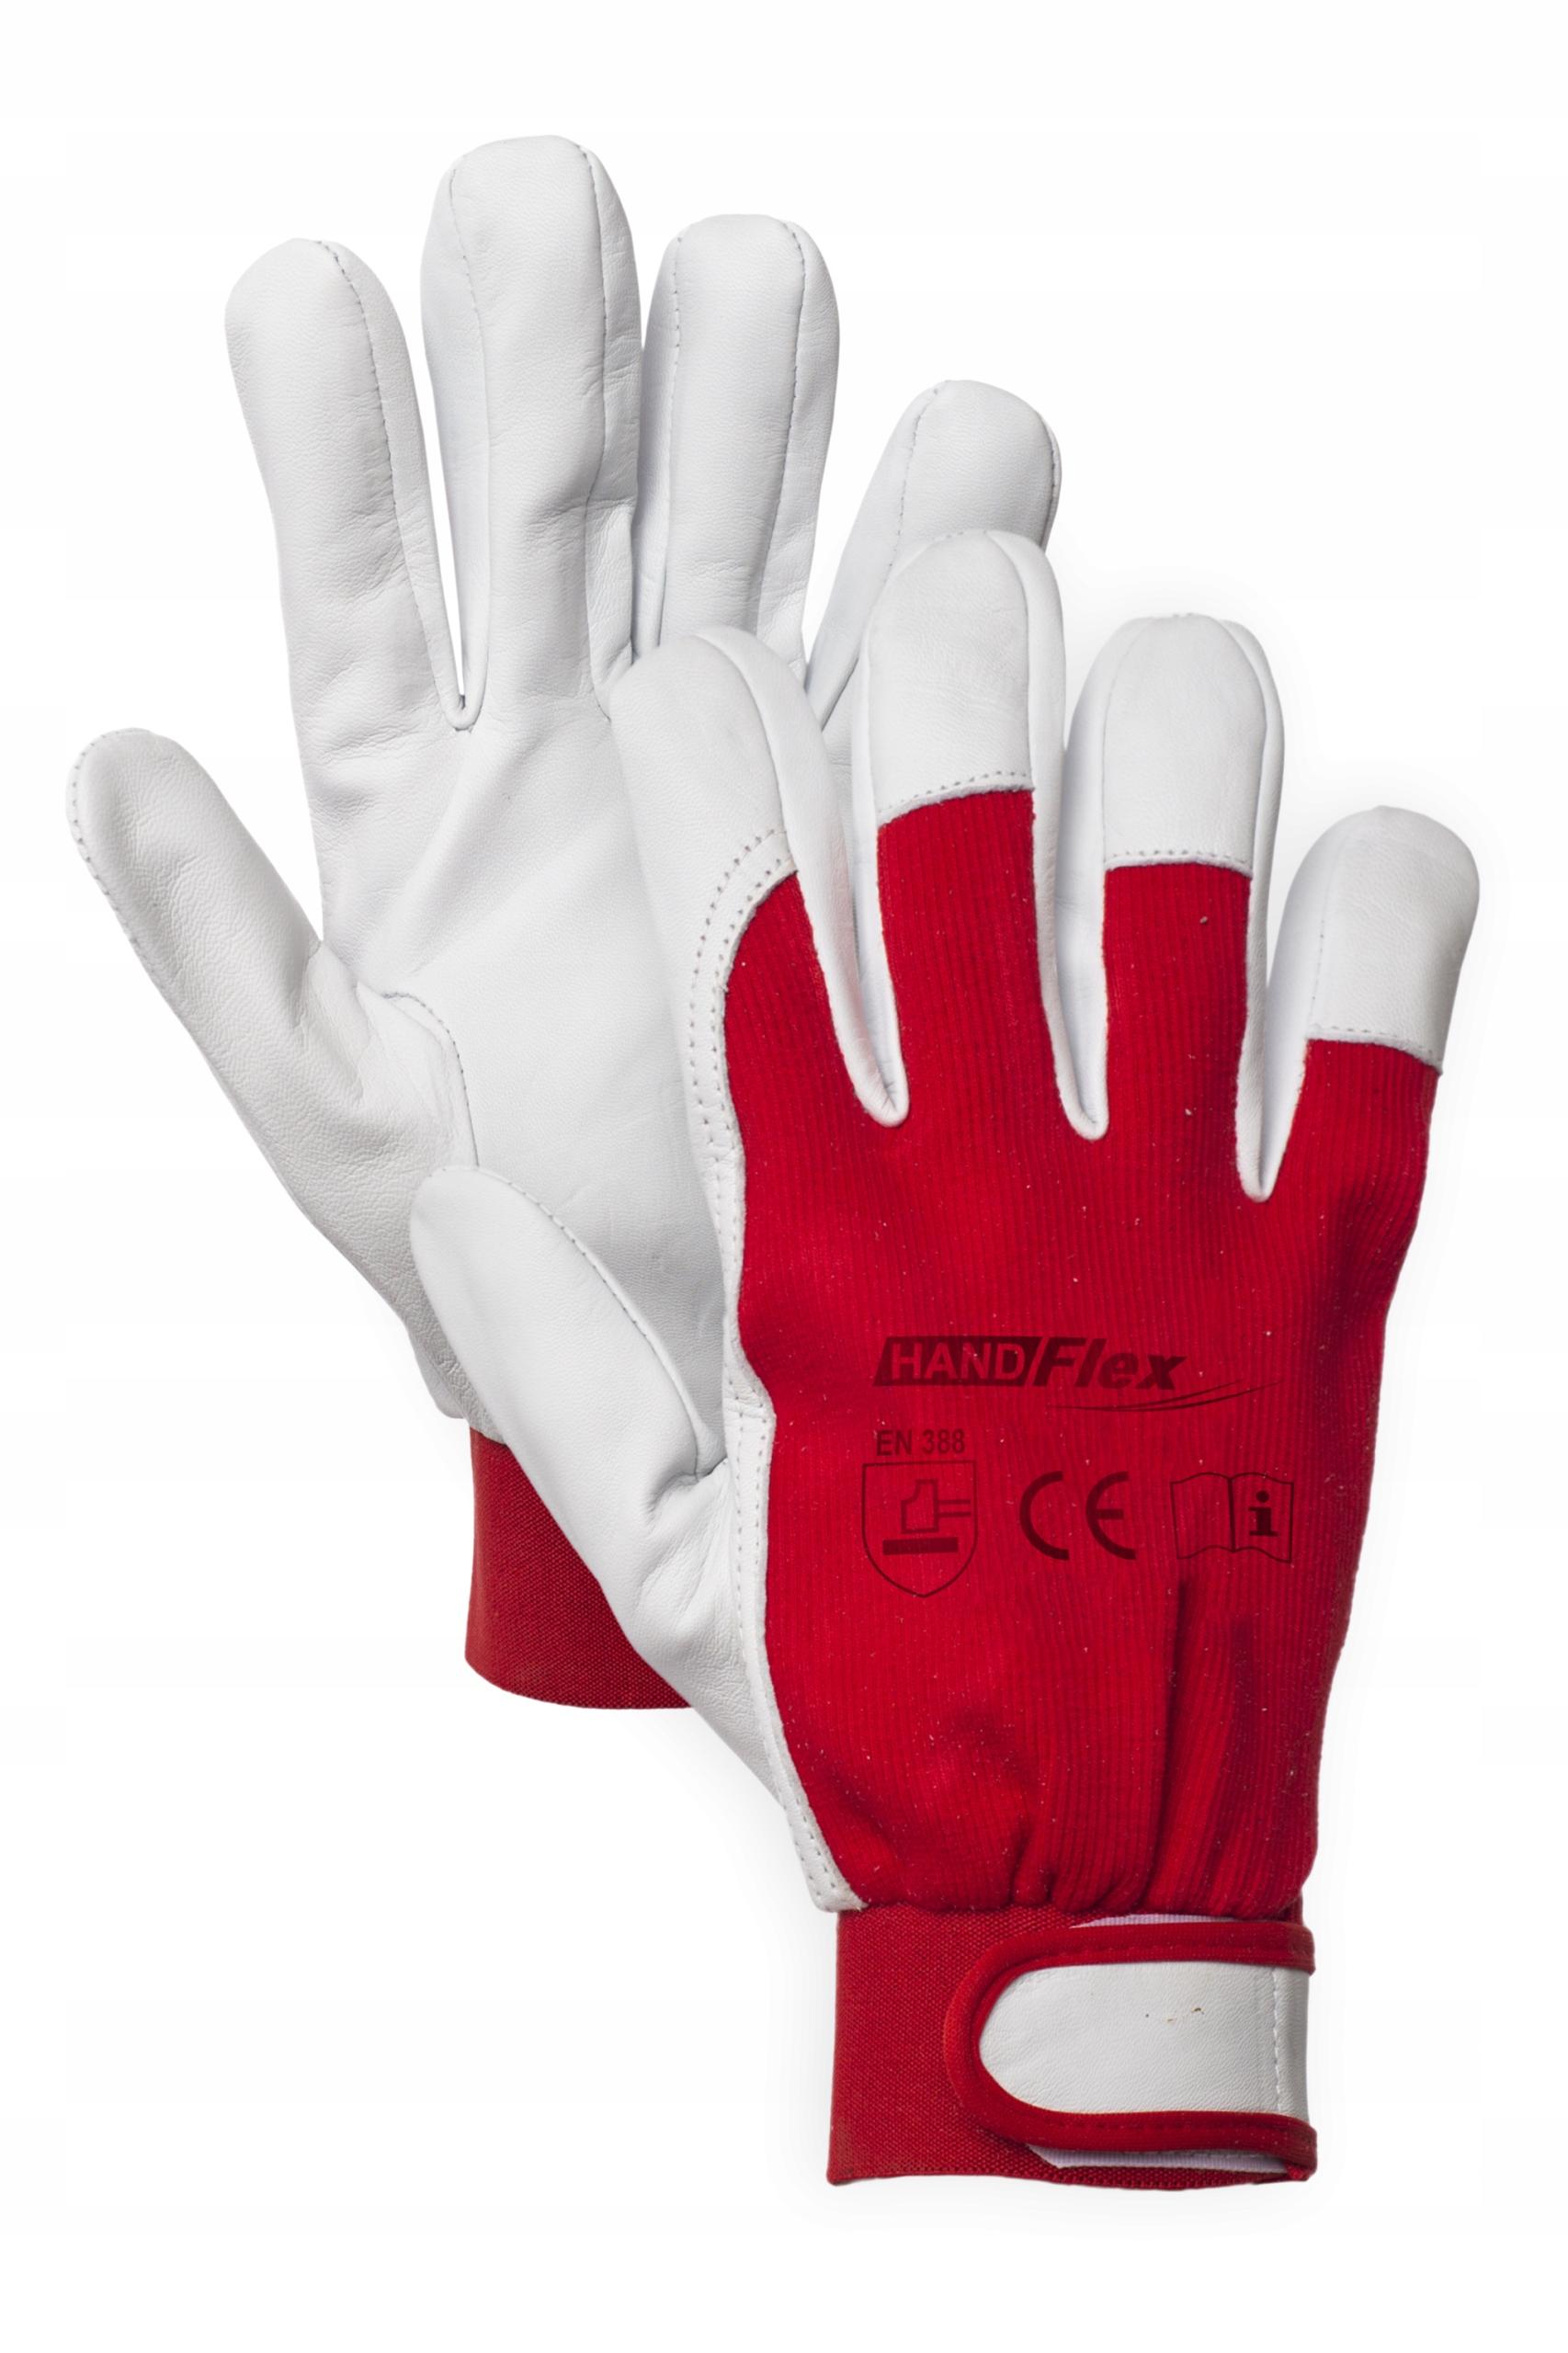 Rękawice robocze z koziej skóry HAND FLEX 4011 r10